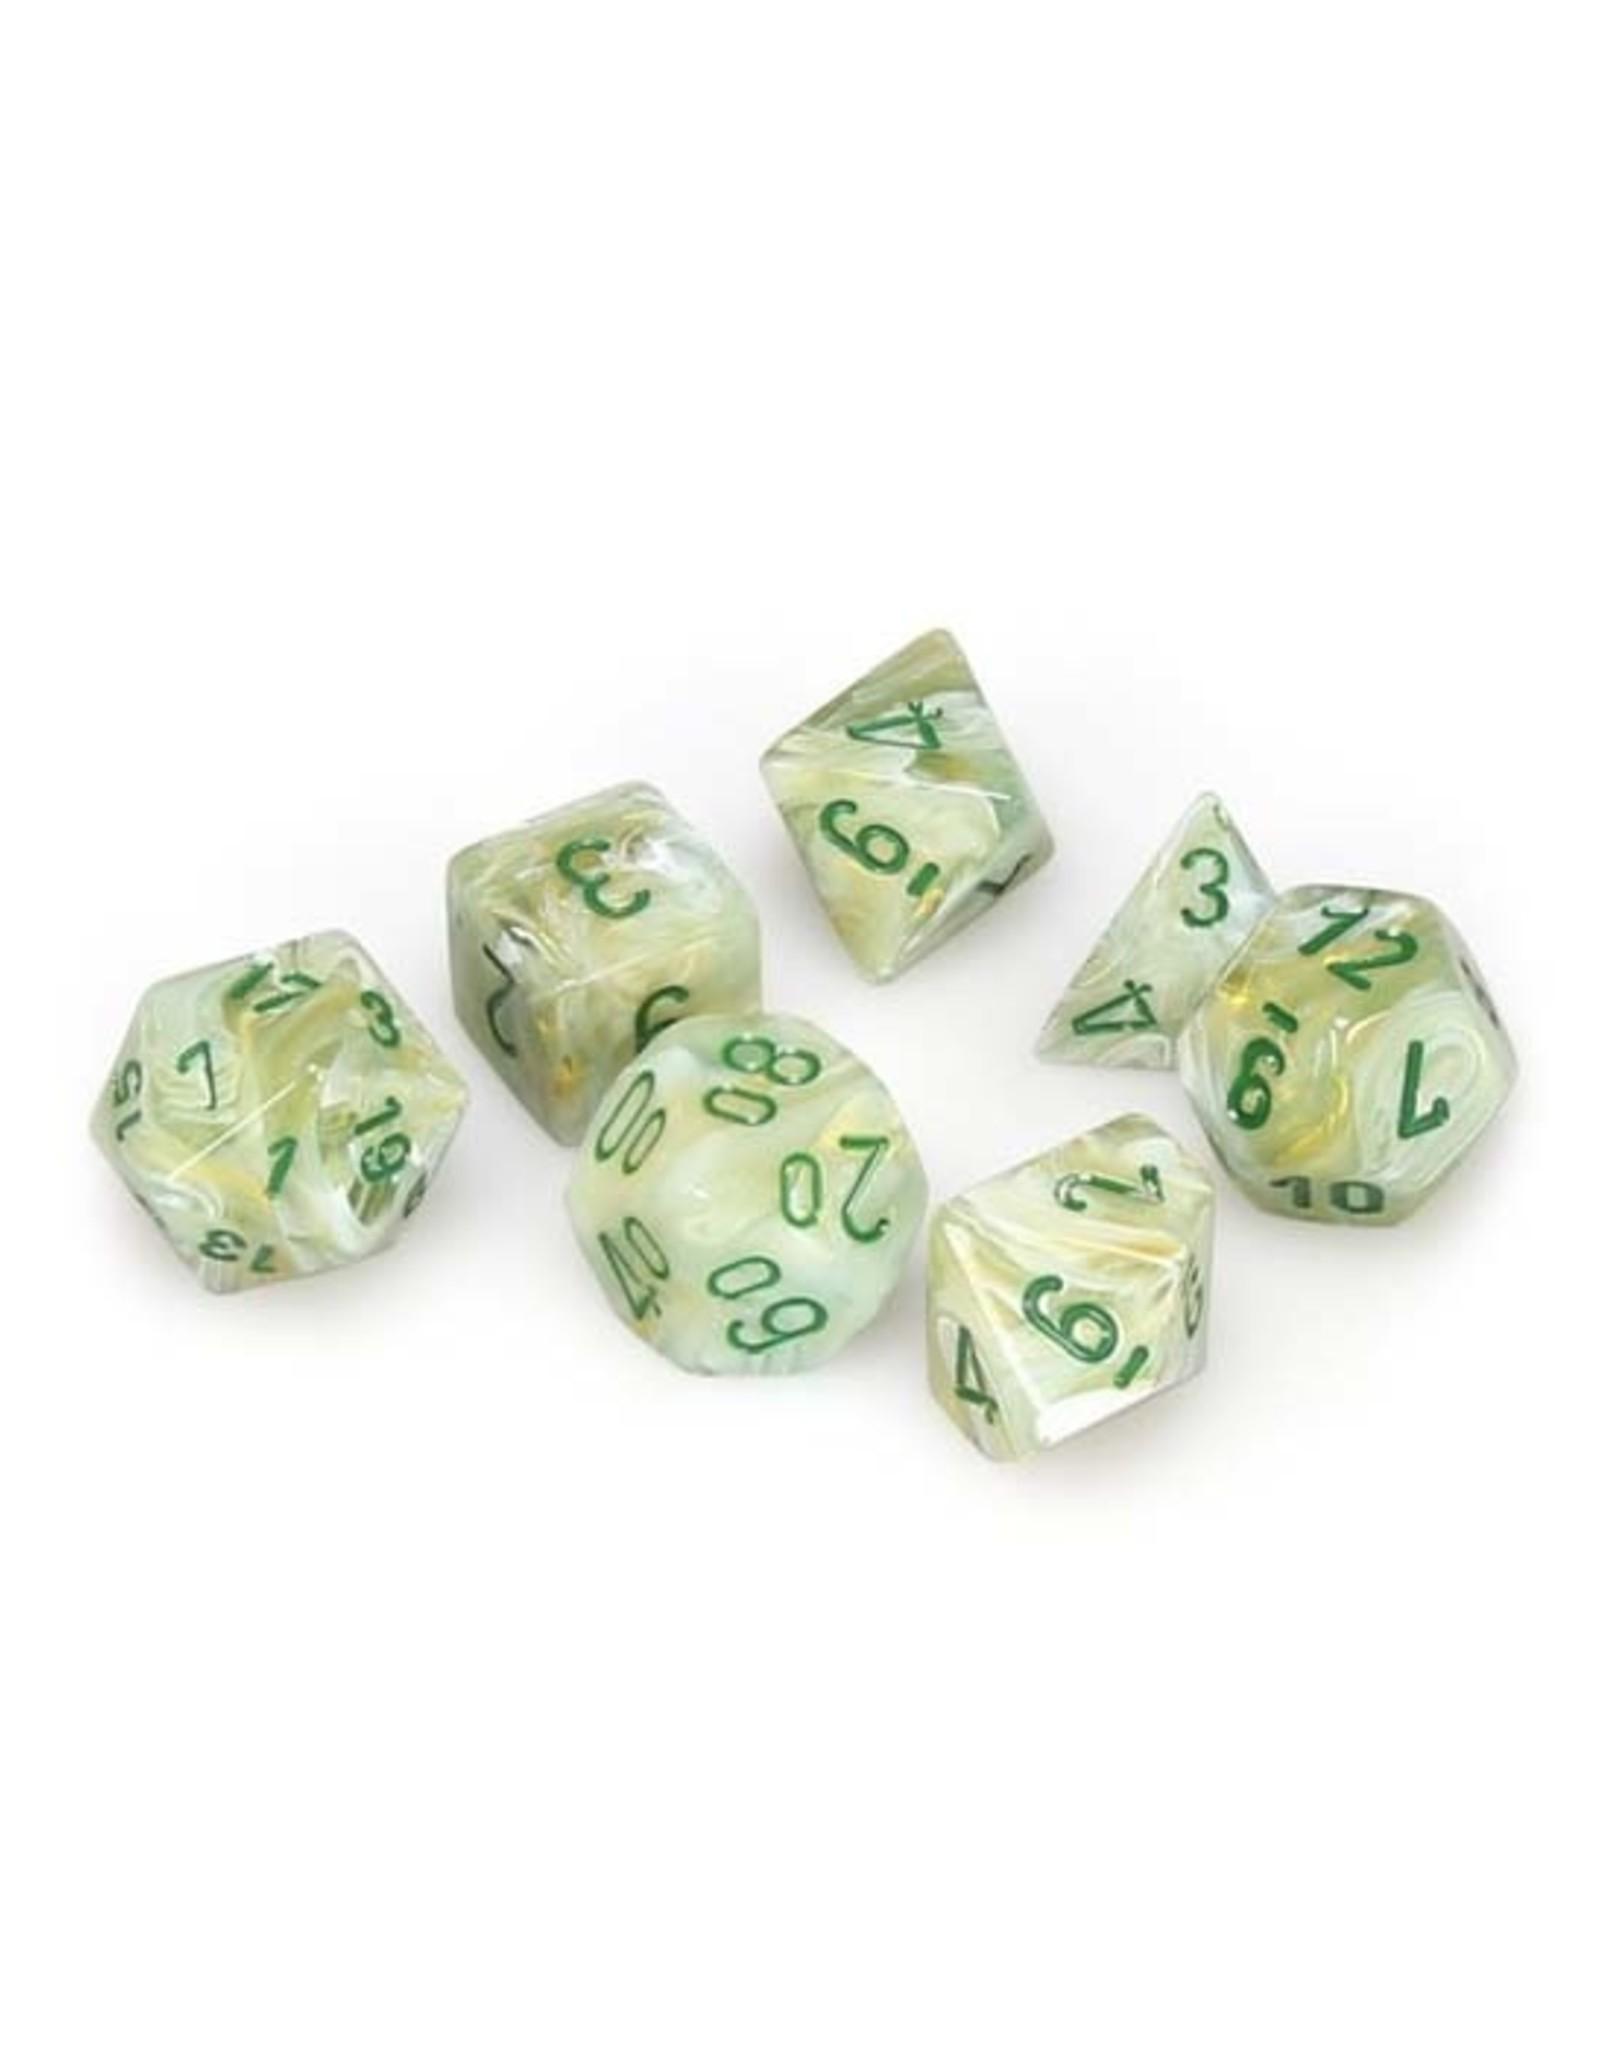 Chessex Chessex: Poly 7 Set - Marble - Green w/ Dark Green